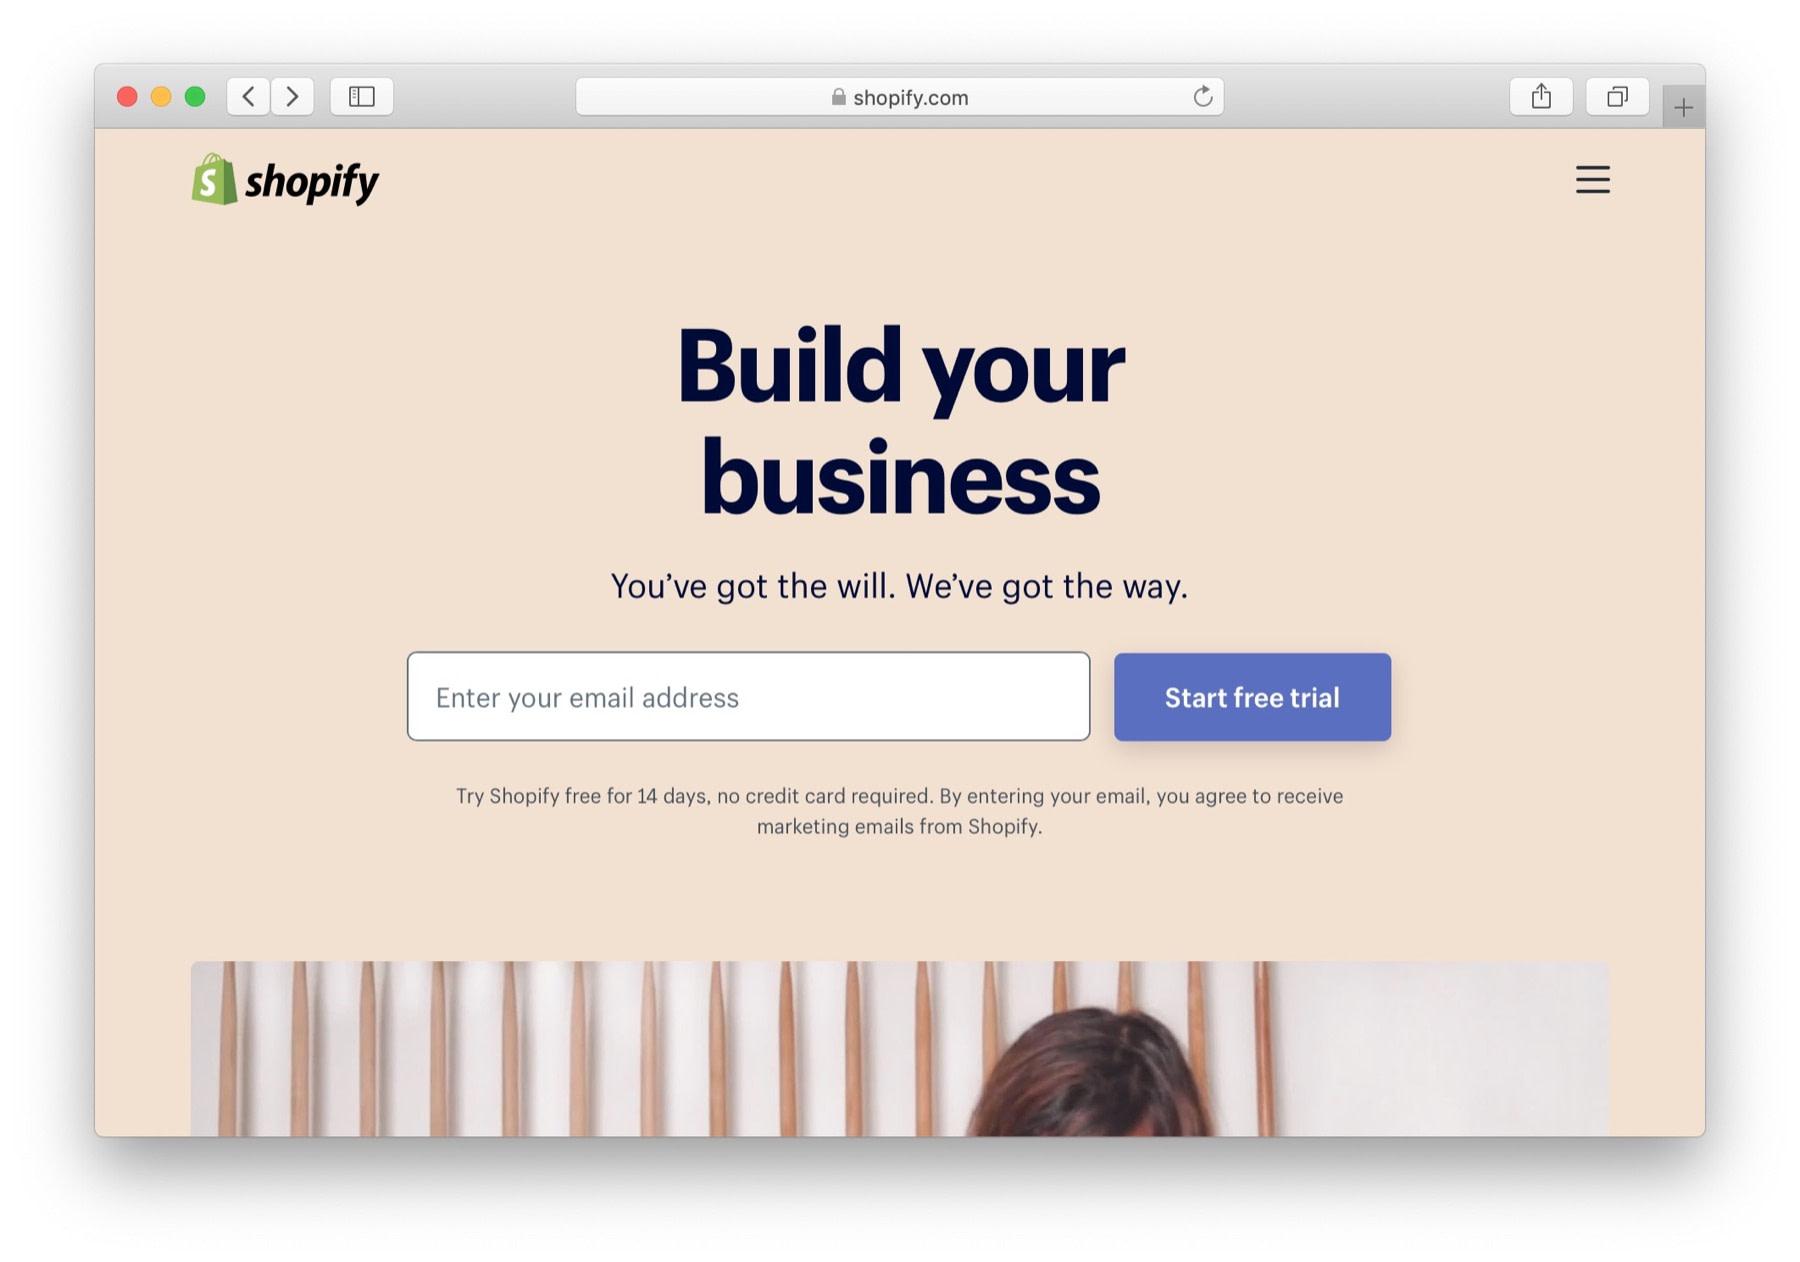 shopify - great platform to start eCommerce business